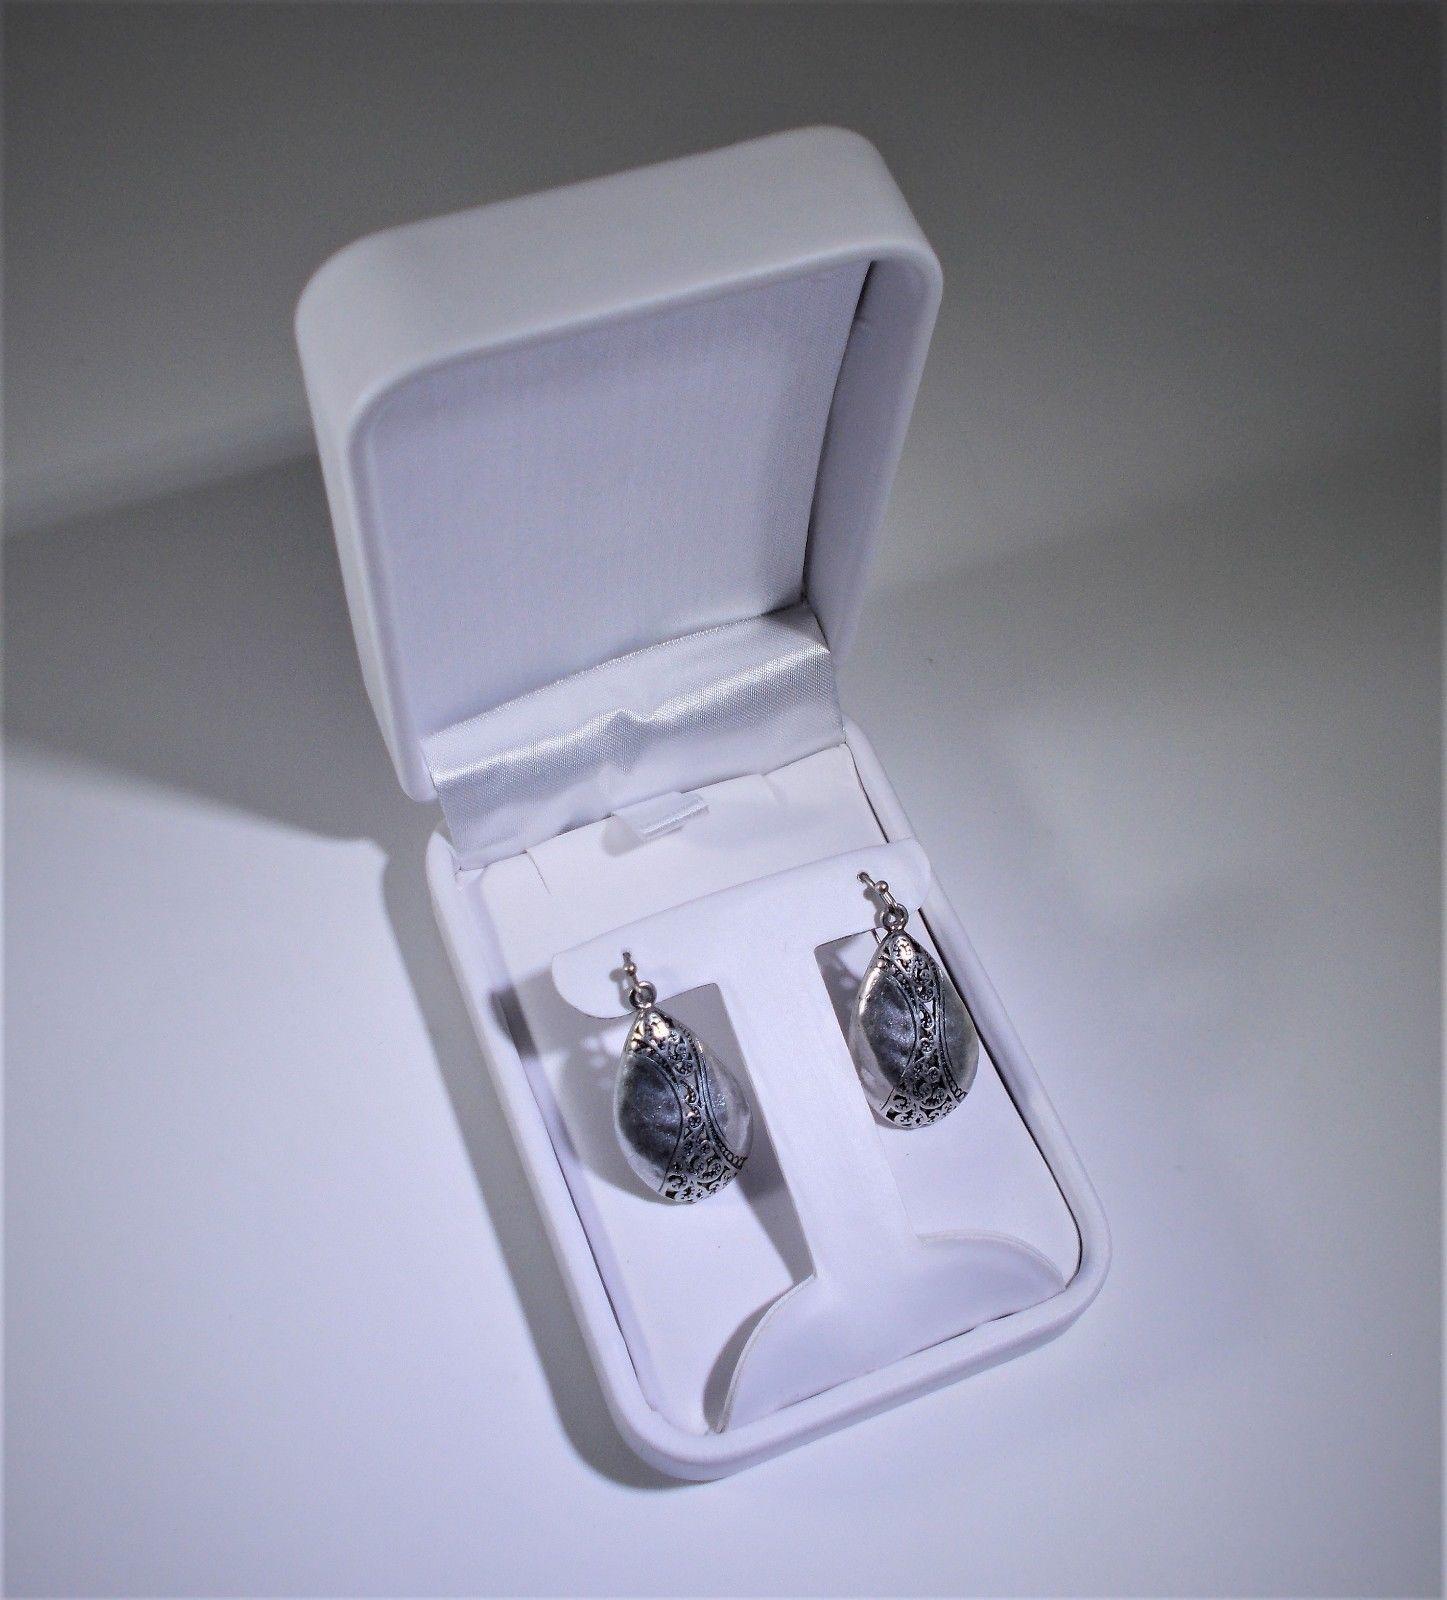 White Leatherette Jewelry Box W T Insert 4 X 2 3 1 Full Case 144pcs